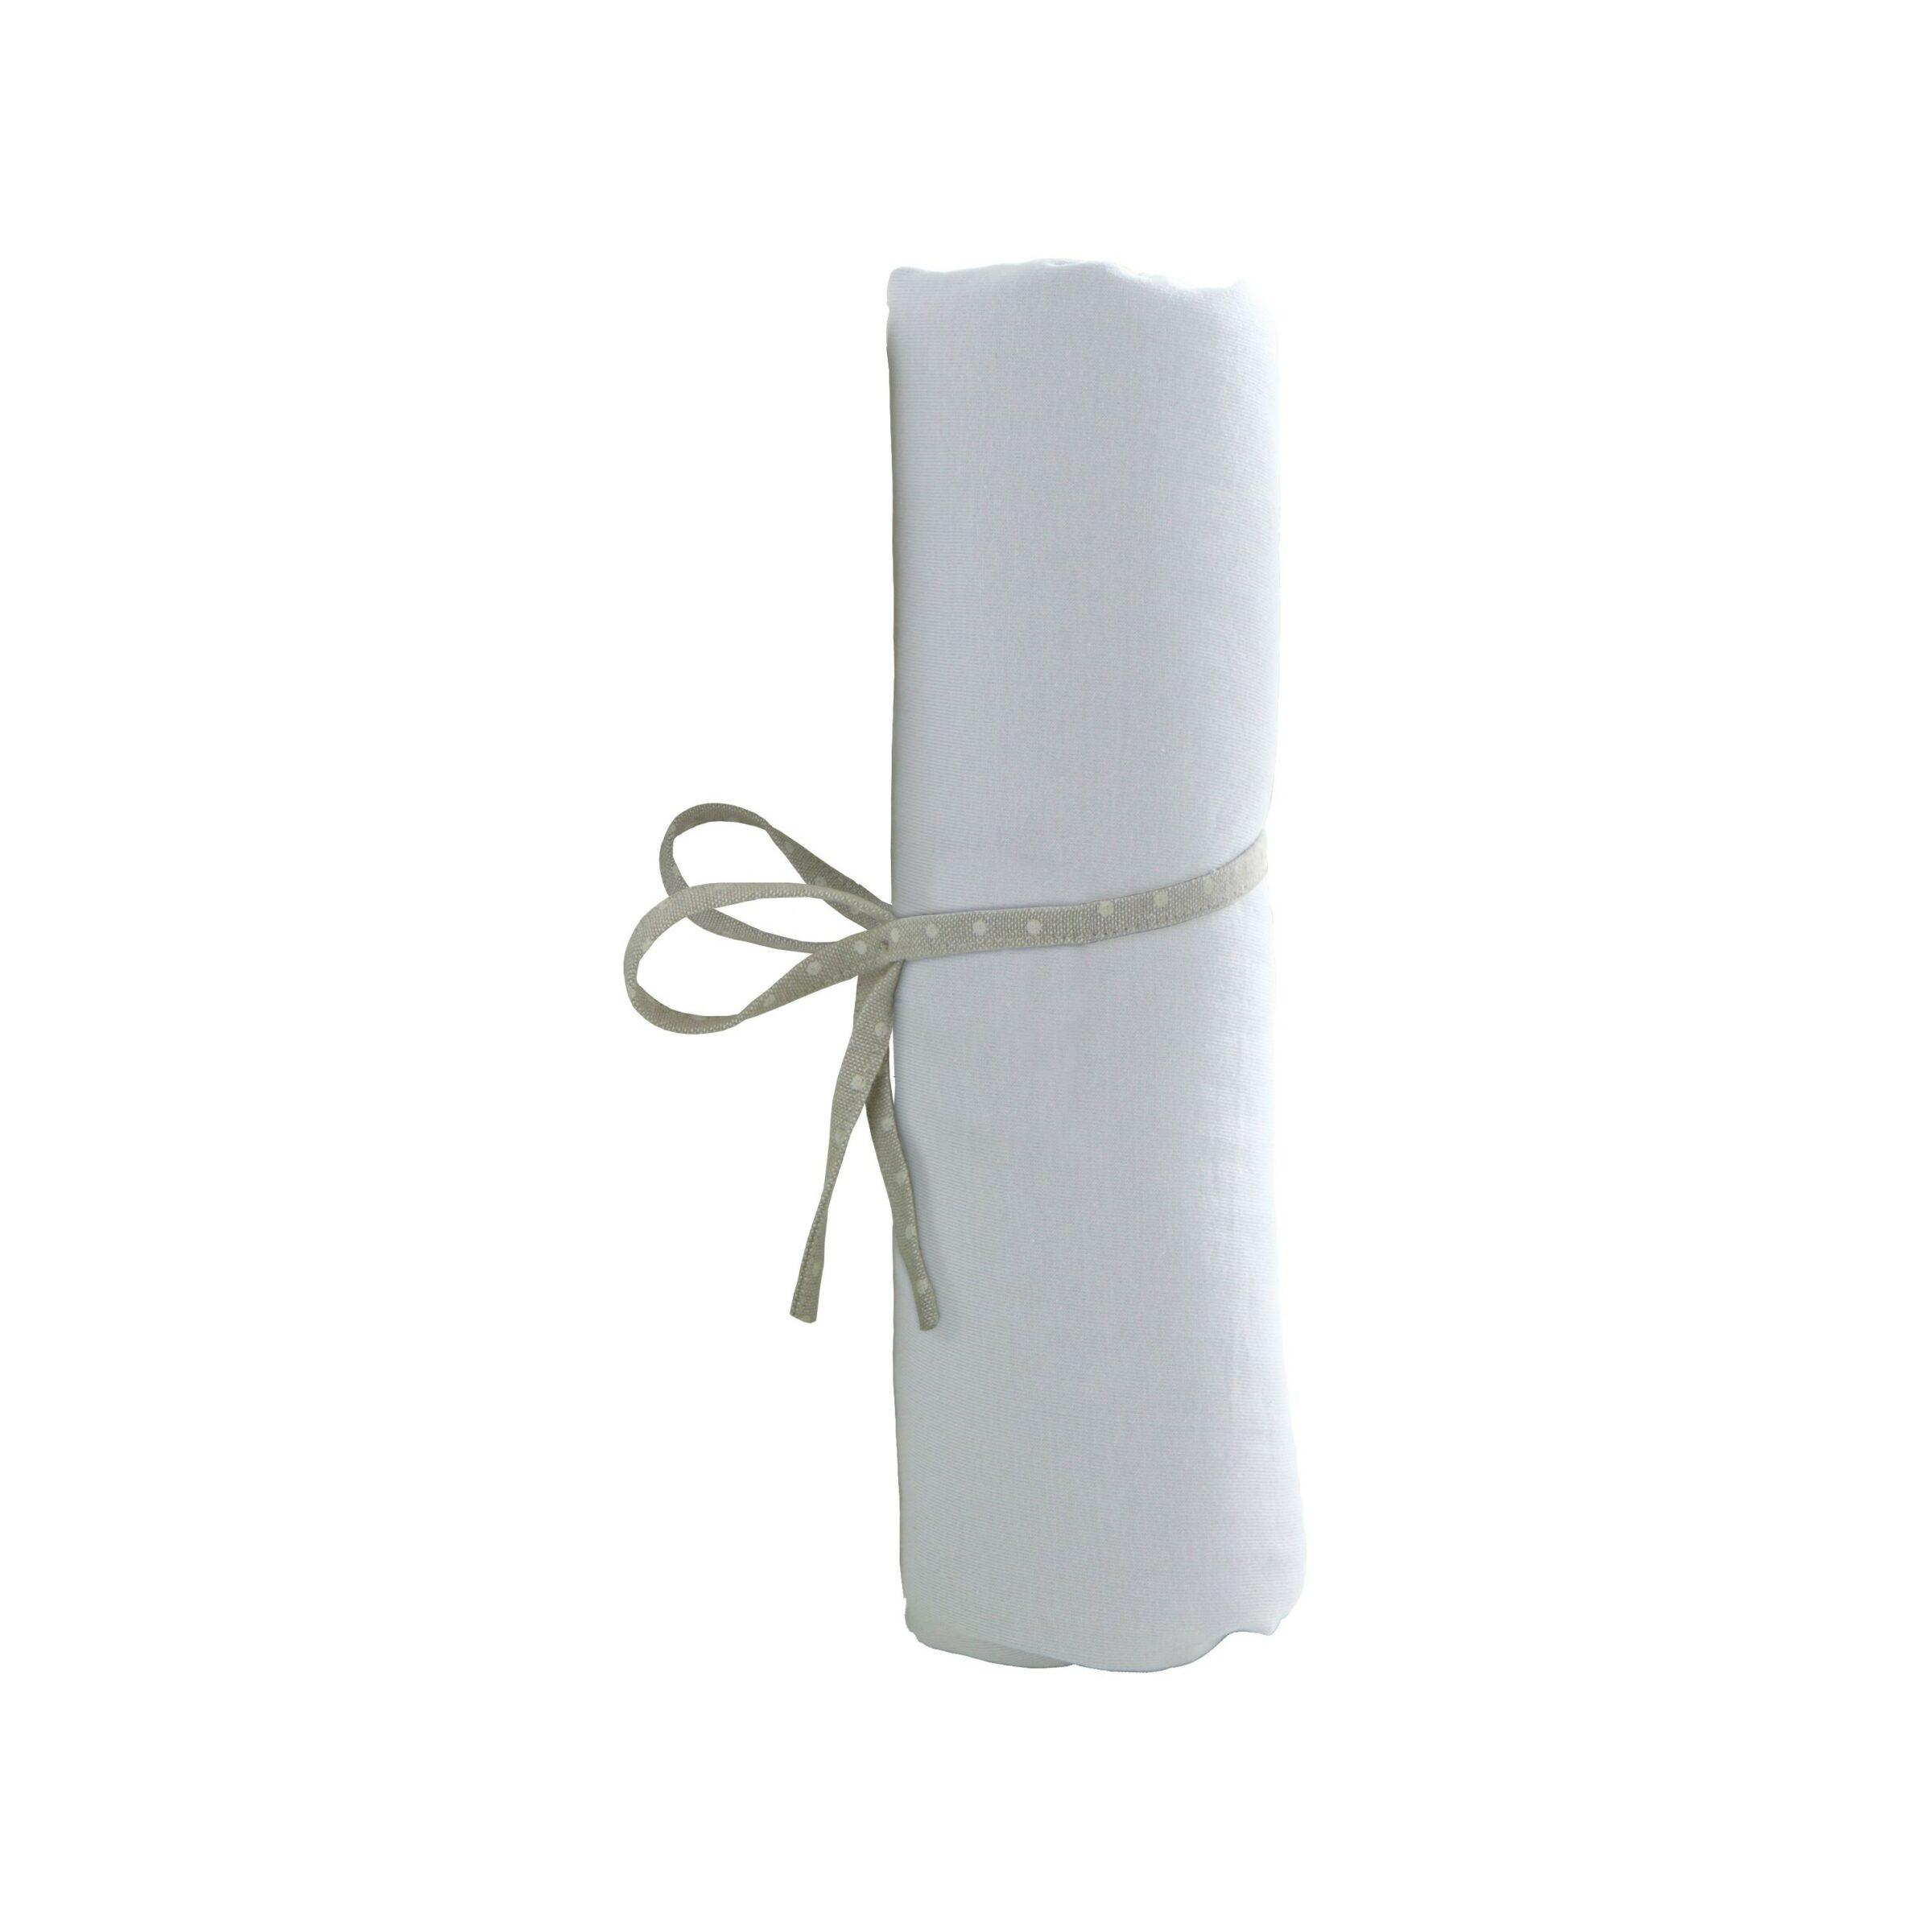 AT4 Drap Housse 70x140cm Blanc